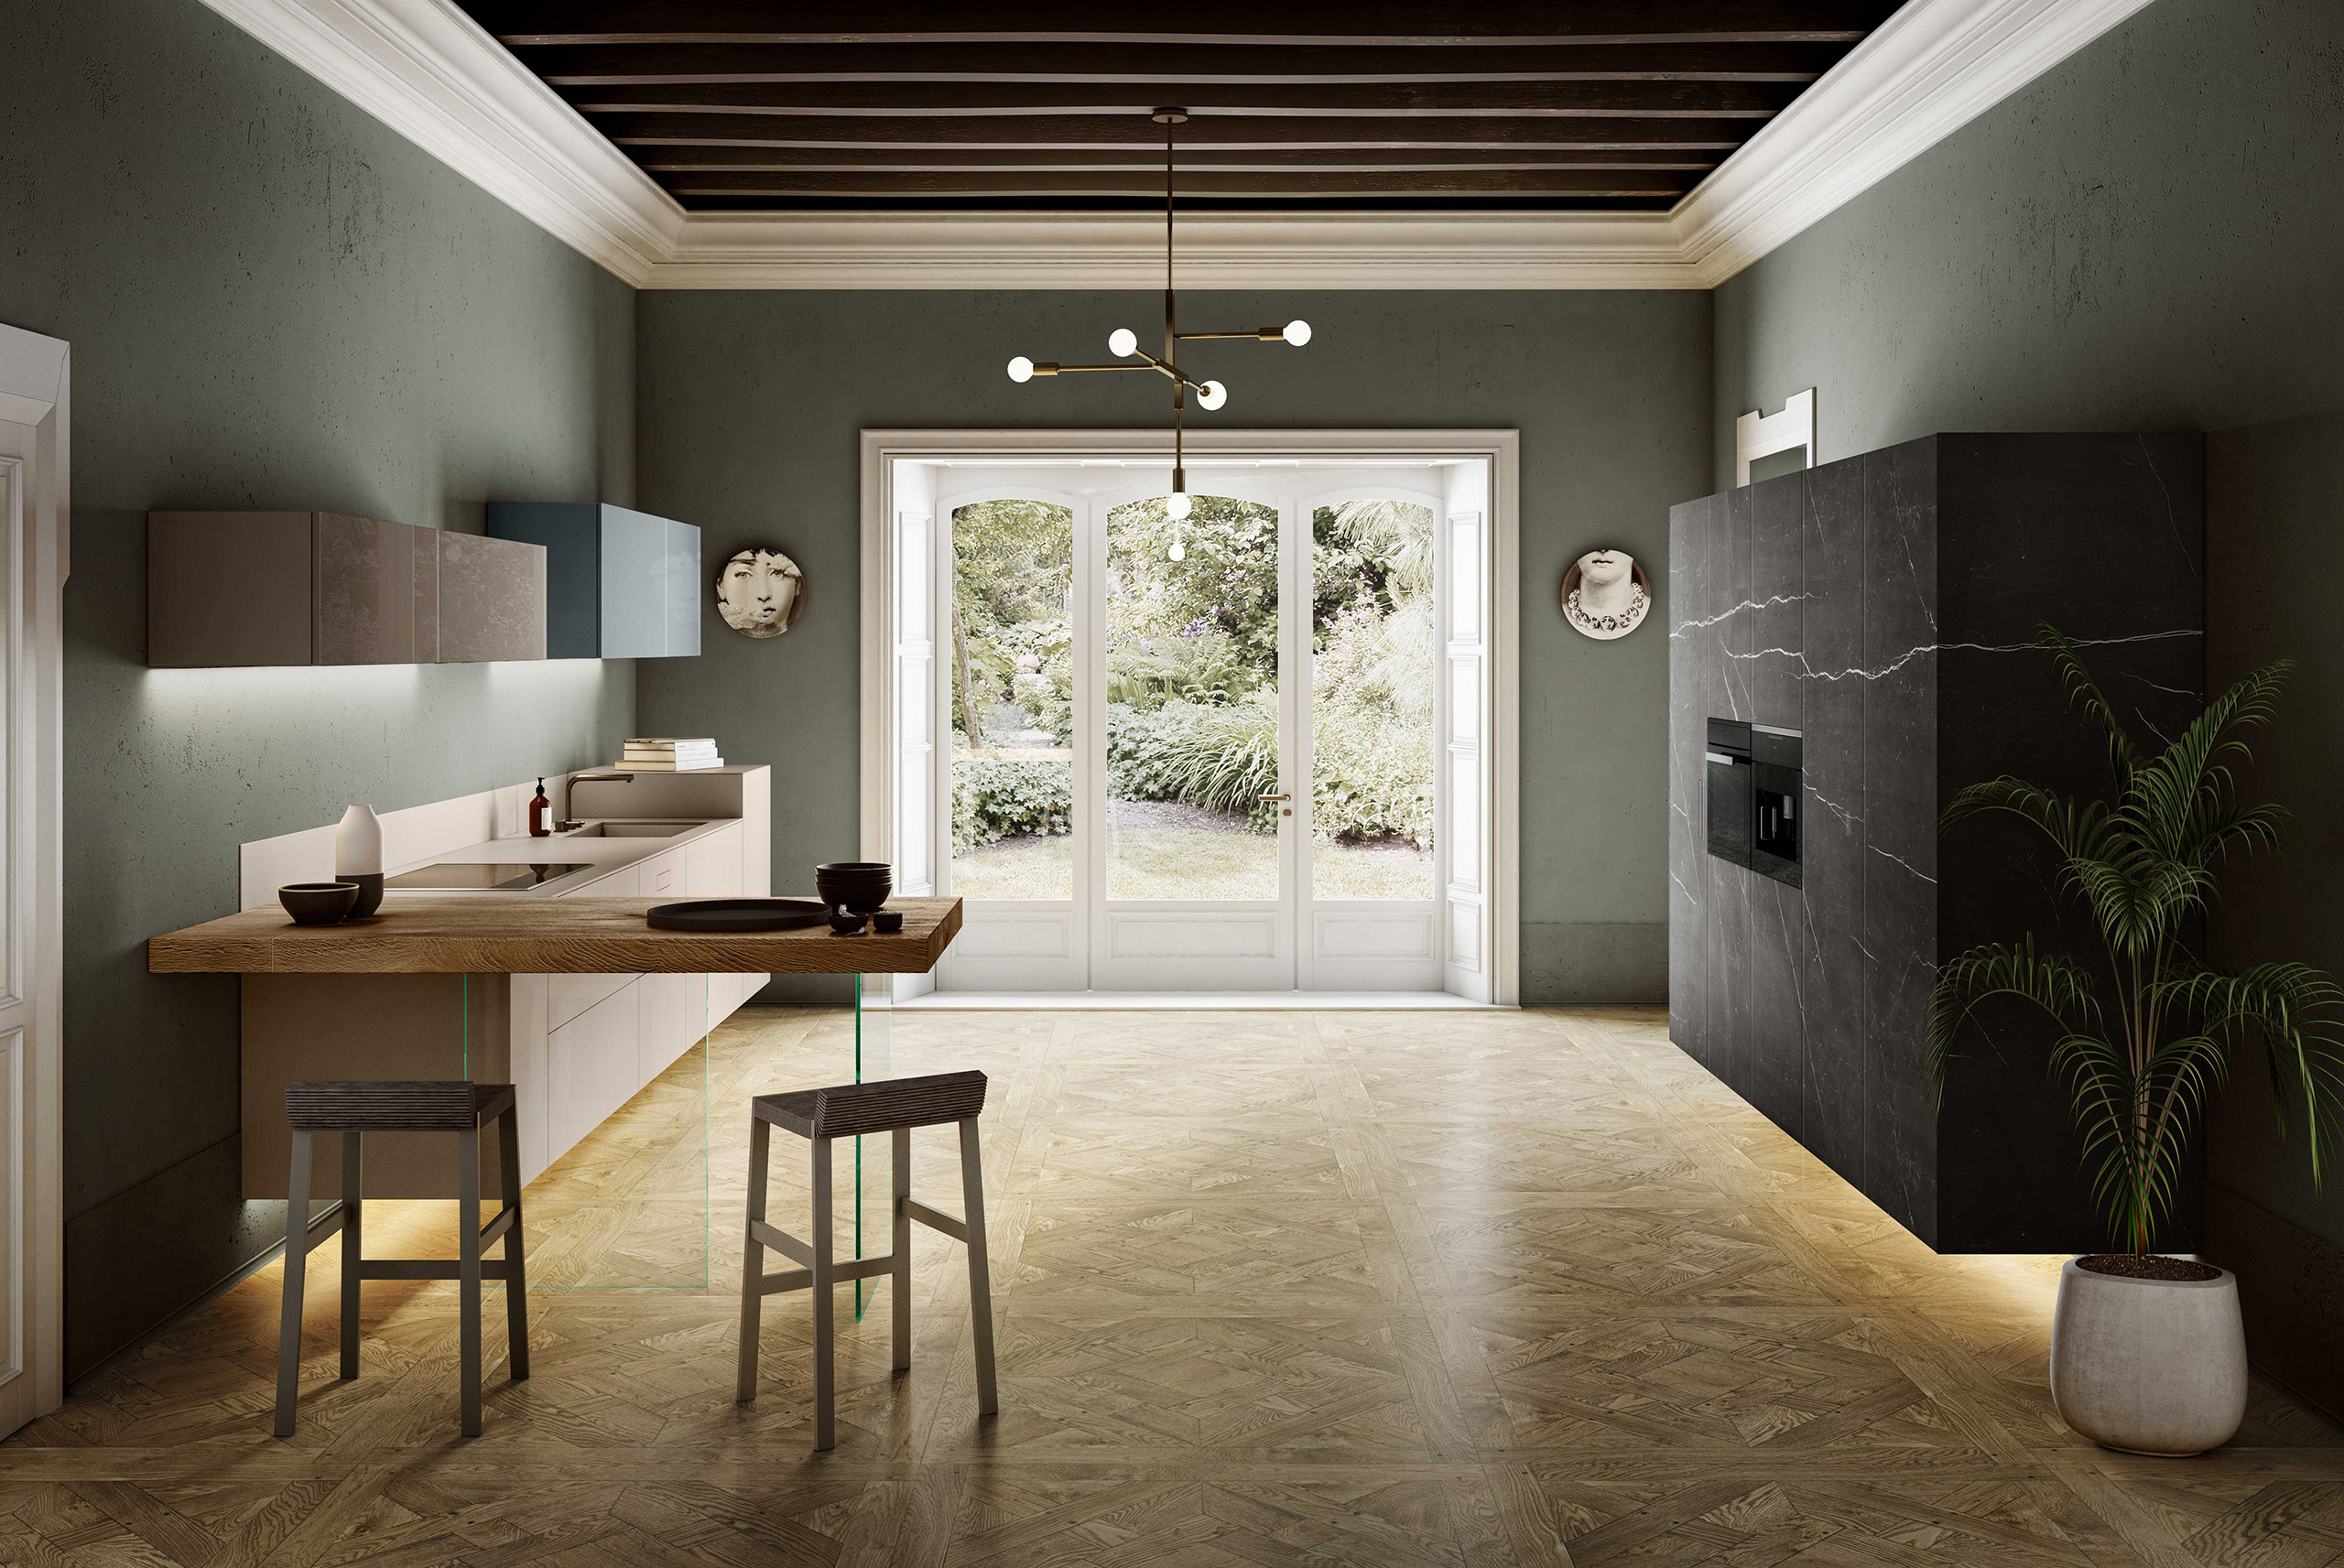 Kitchen-Villa-Italiana-Generale